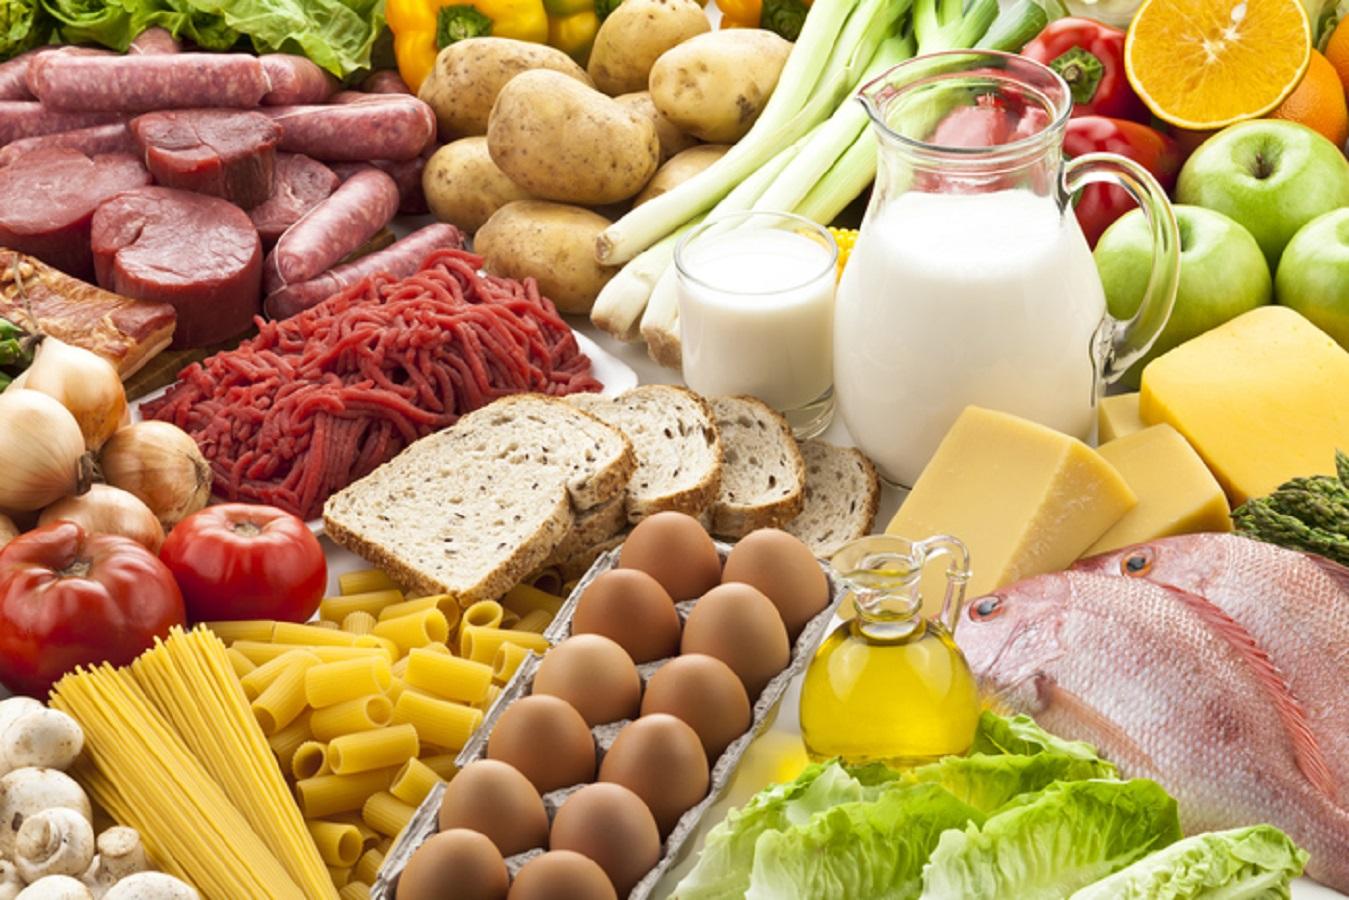 Dieta iperproteica e salute dei reni: cosa devi sapere